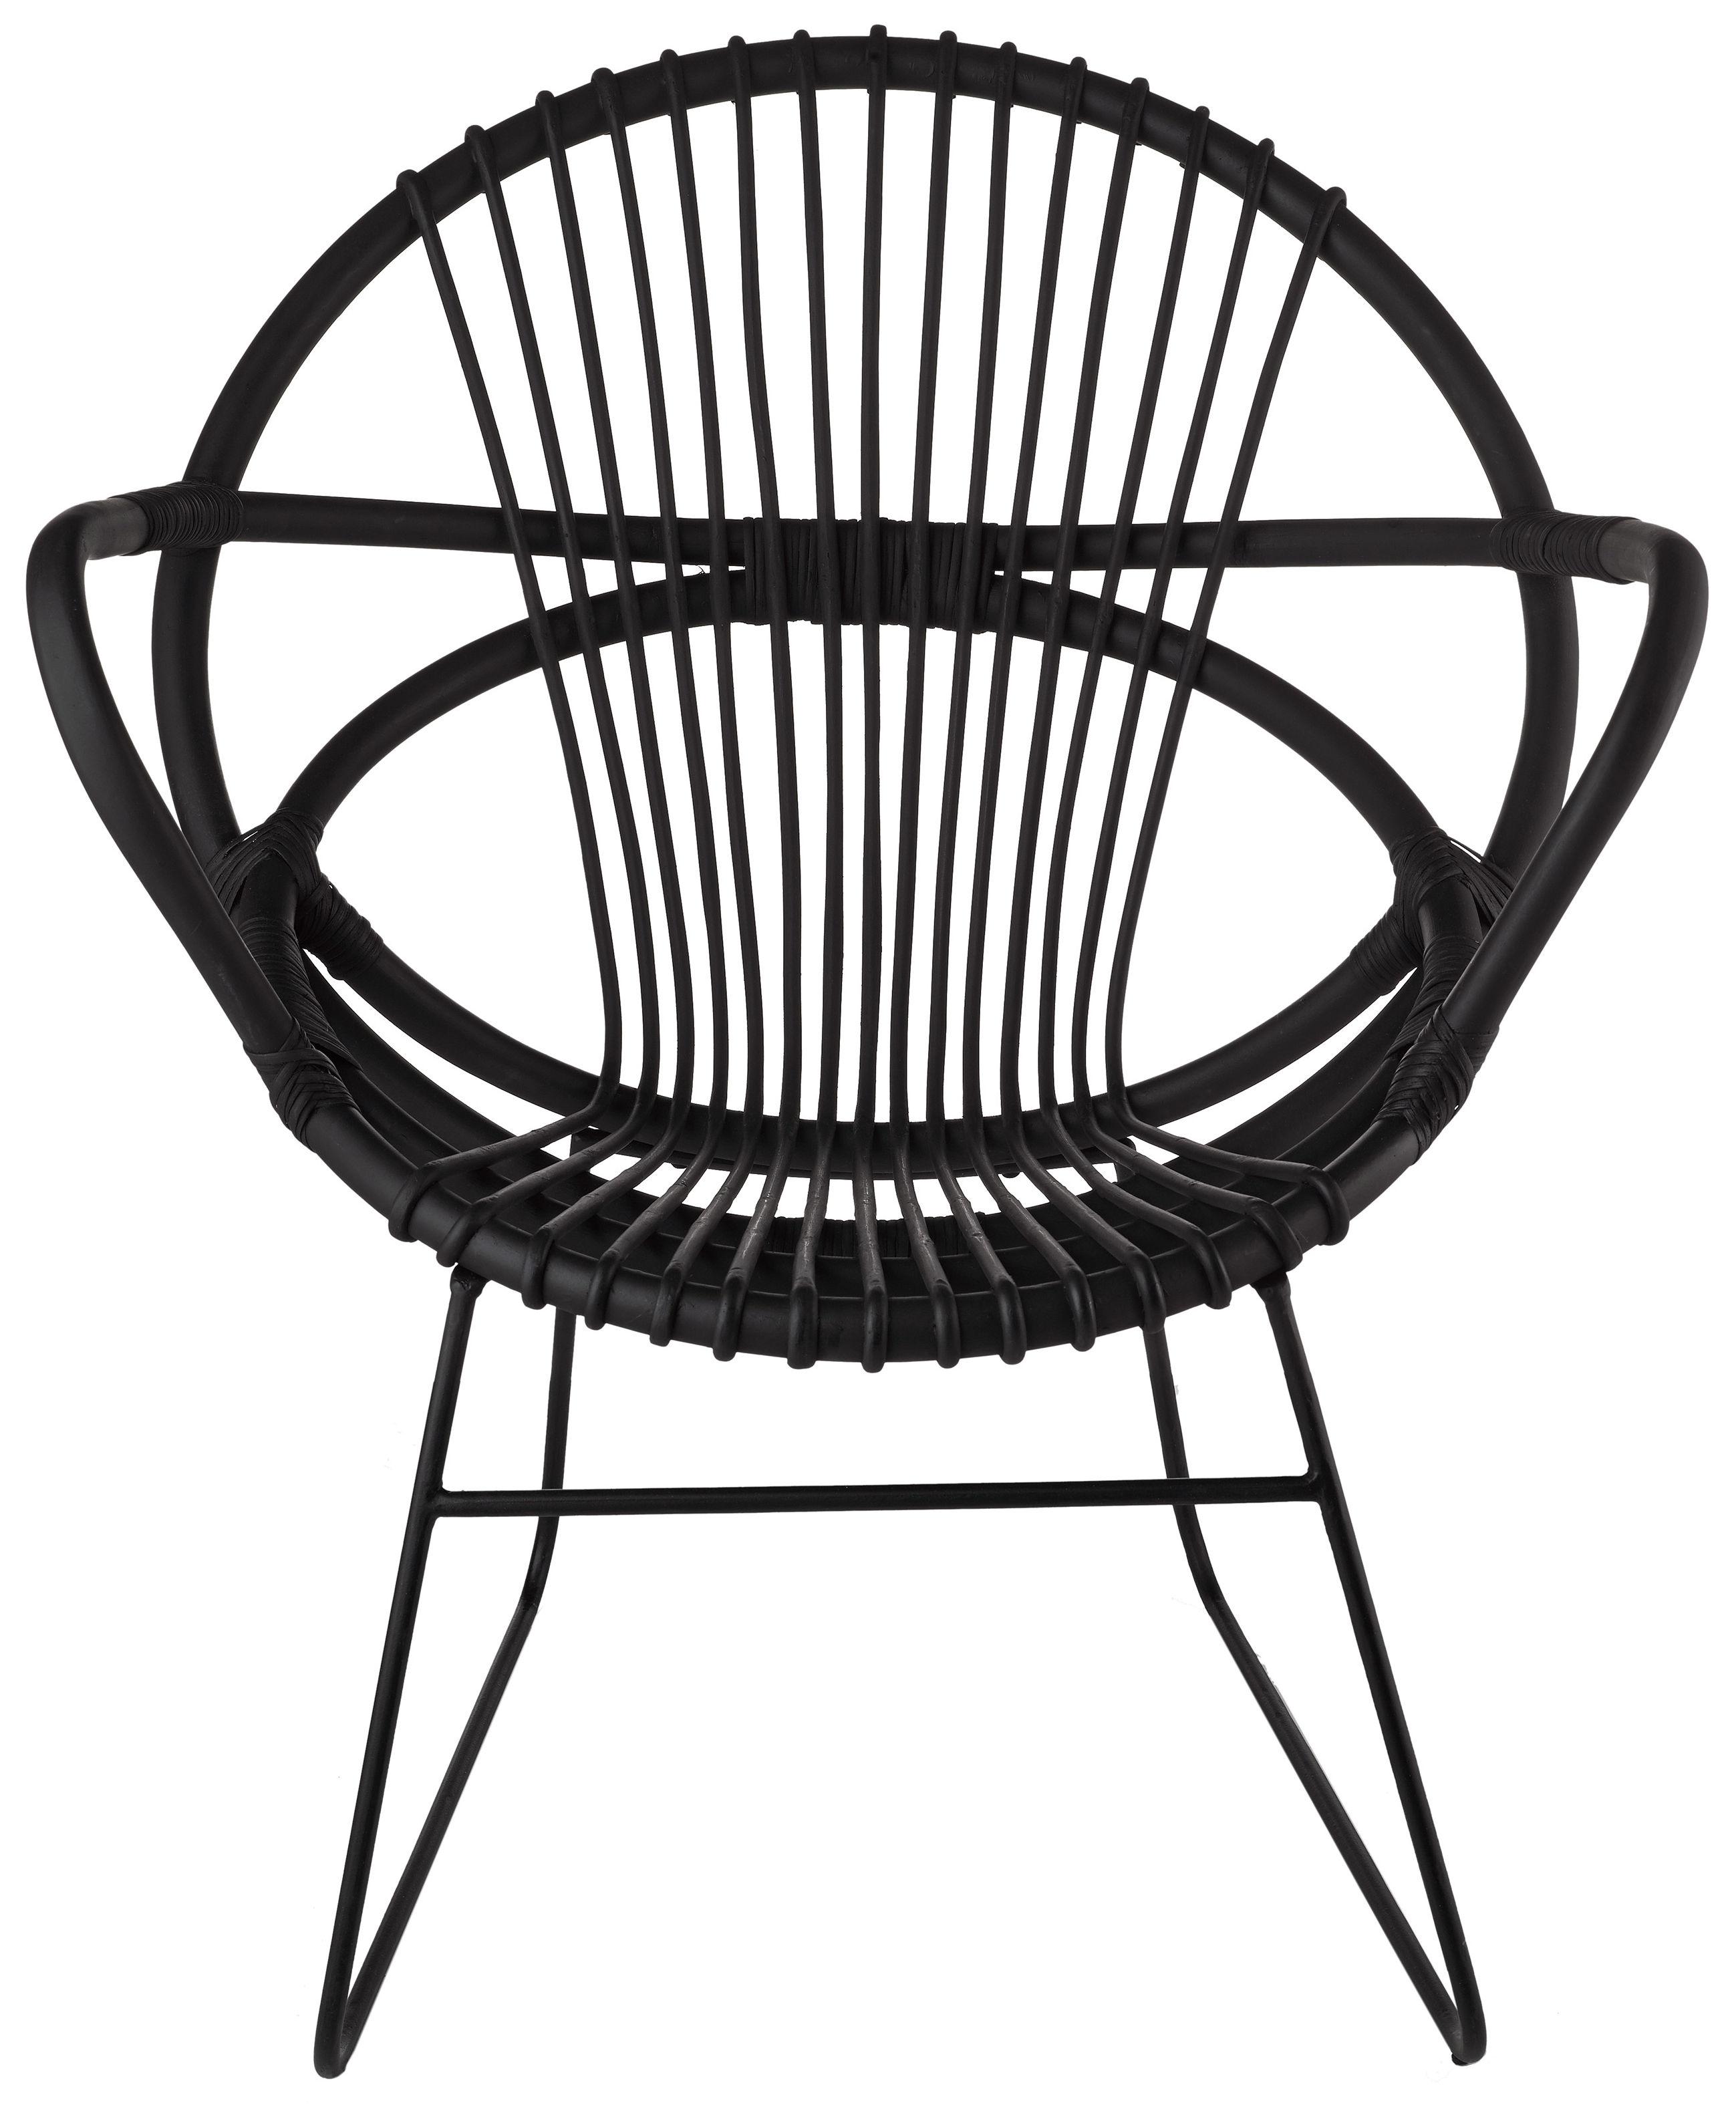 Möbel - Lounge Sessel - Singapore Sessel - Pols Potten - Schwarz / Fußgestell schwarz - bemaltes Metall, Rattan